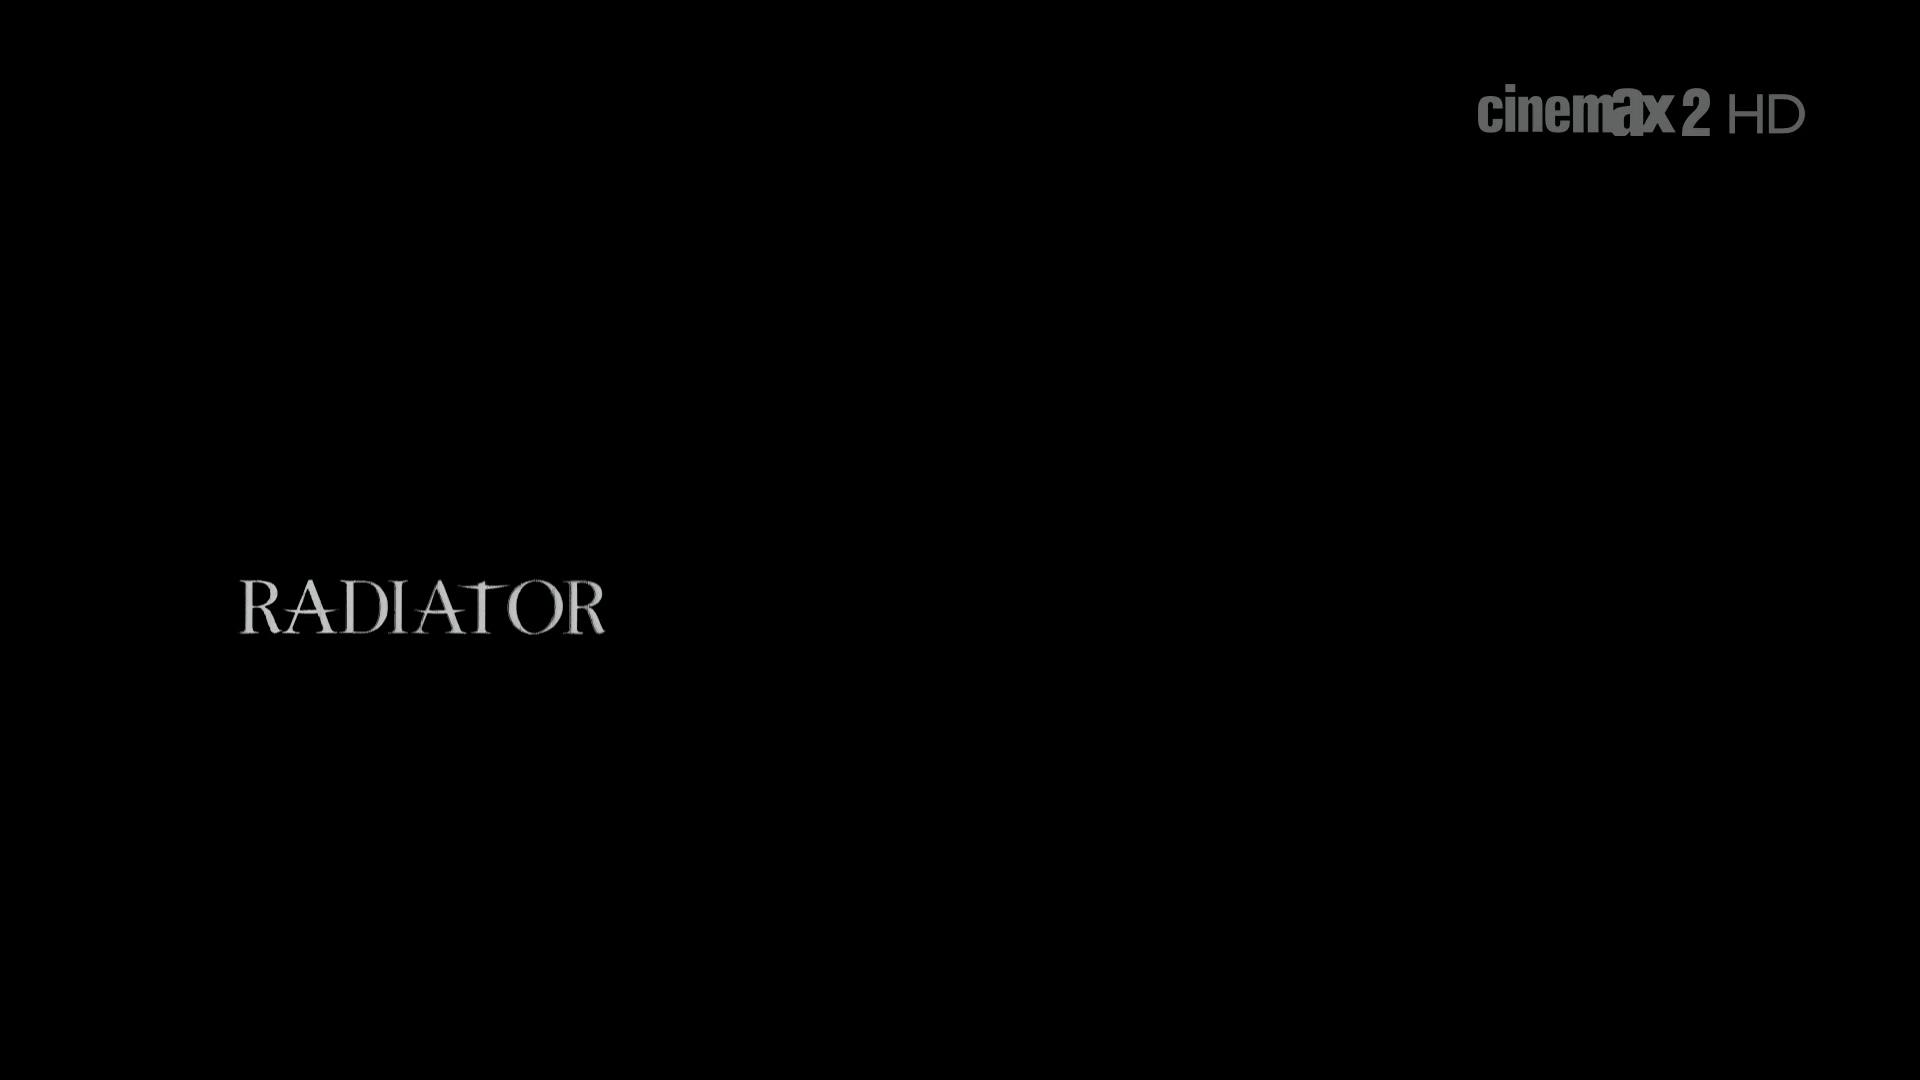 radijator20141080p.mkf6zt6.jpg